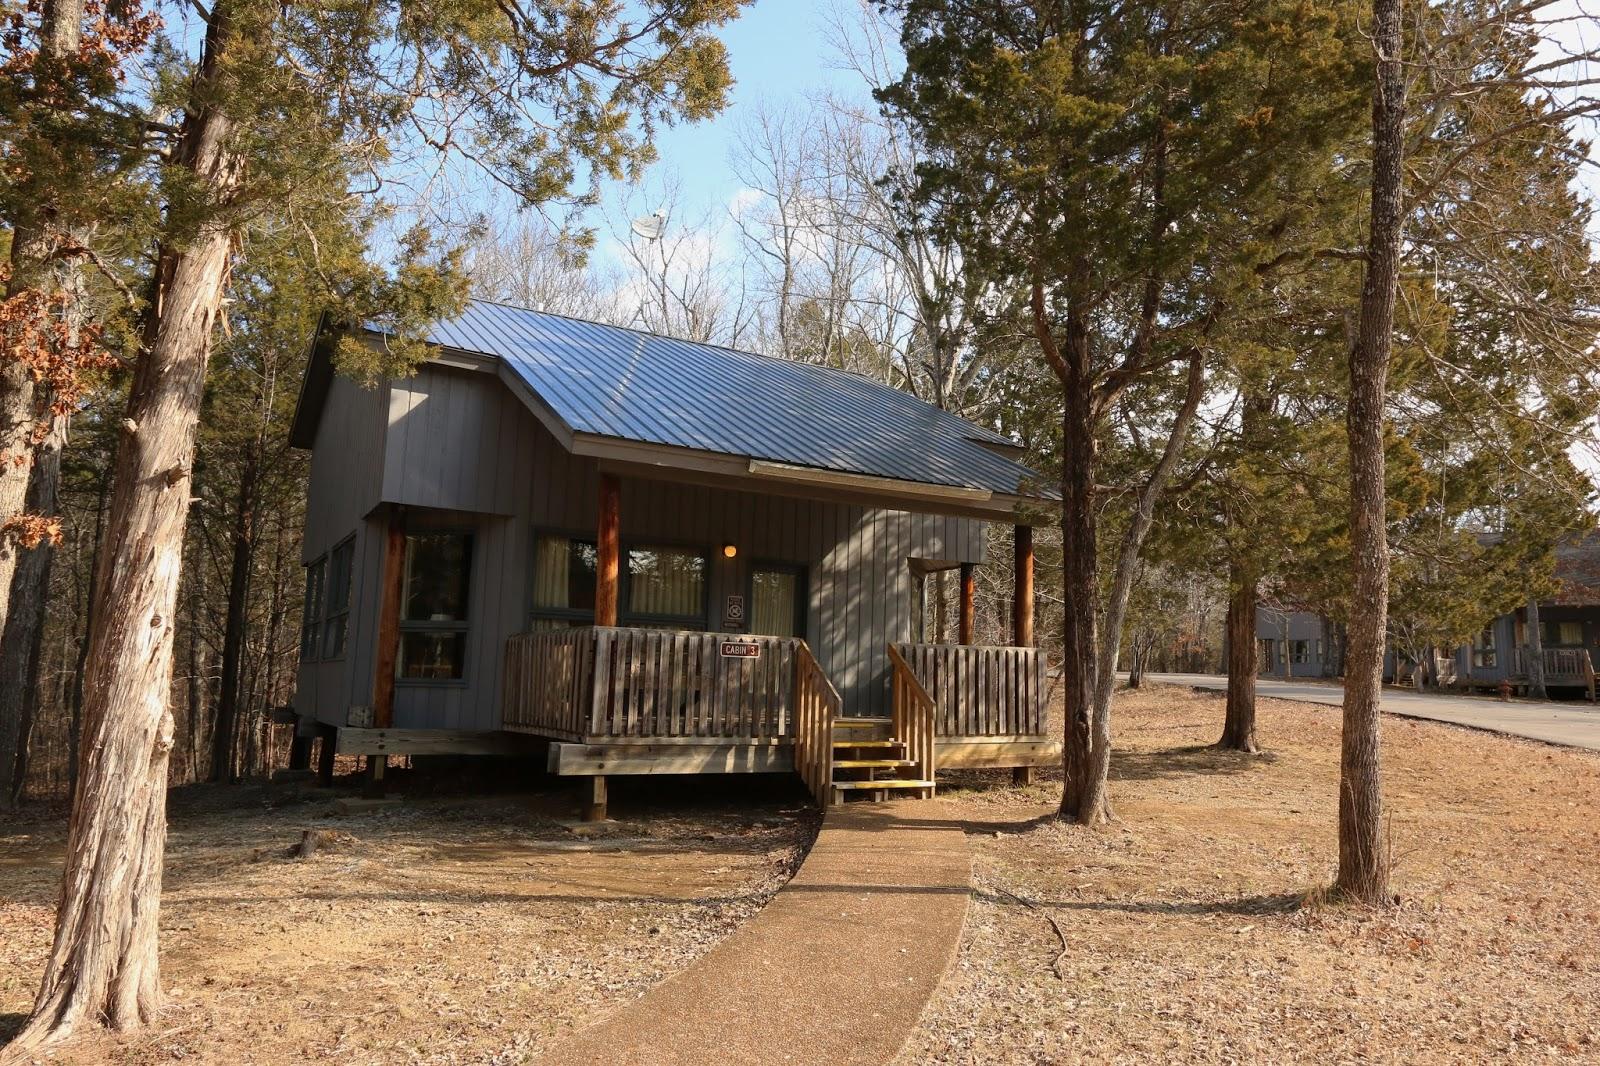 Nomadic newfies cedars of lebanon and gatlinburg at last for Cedars of lebanon cabins